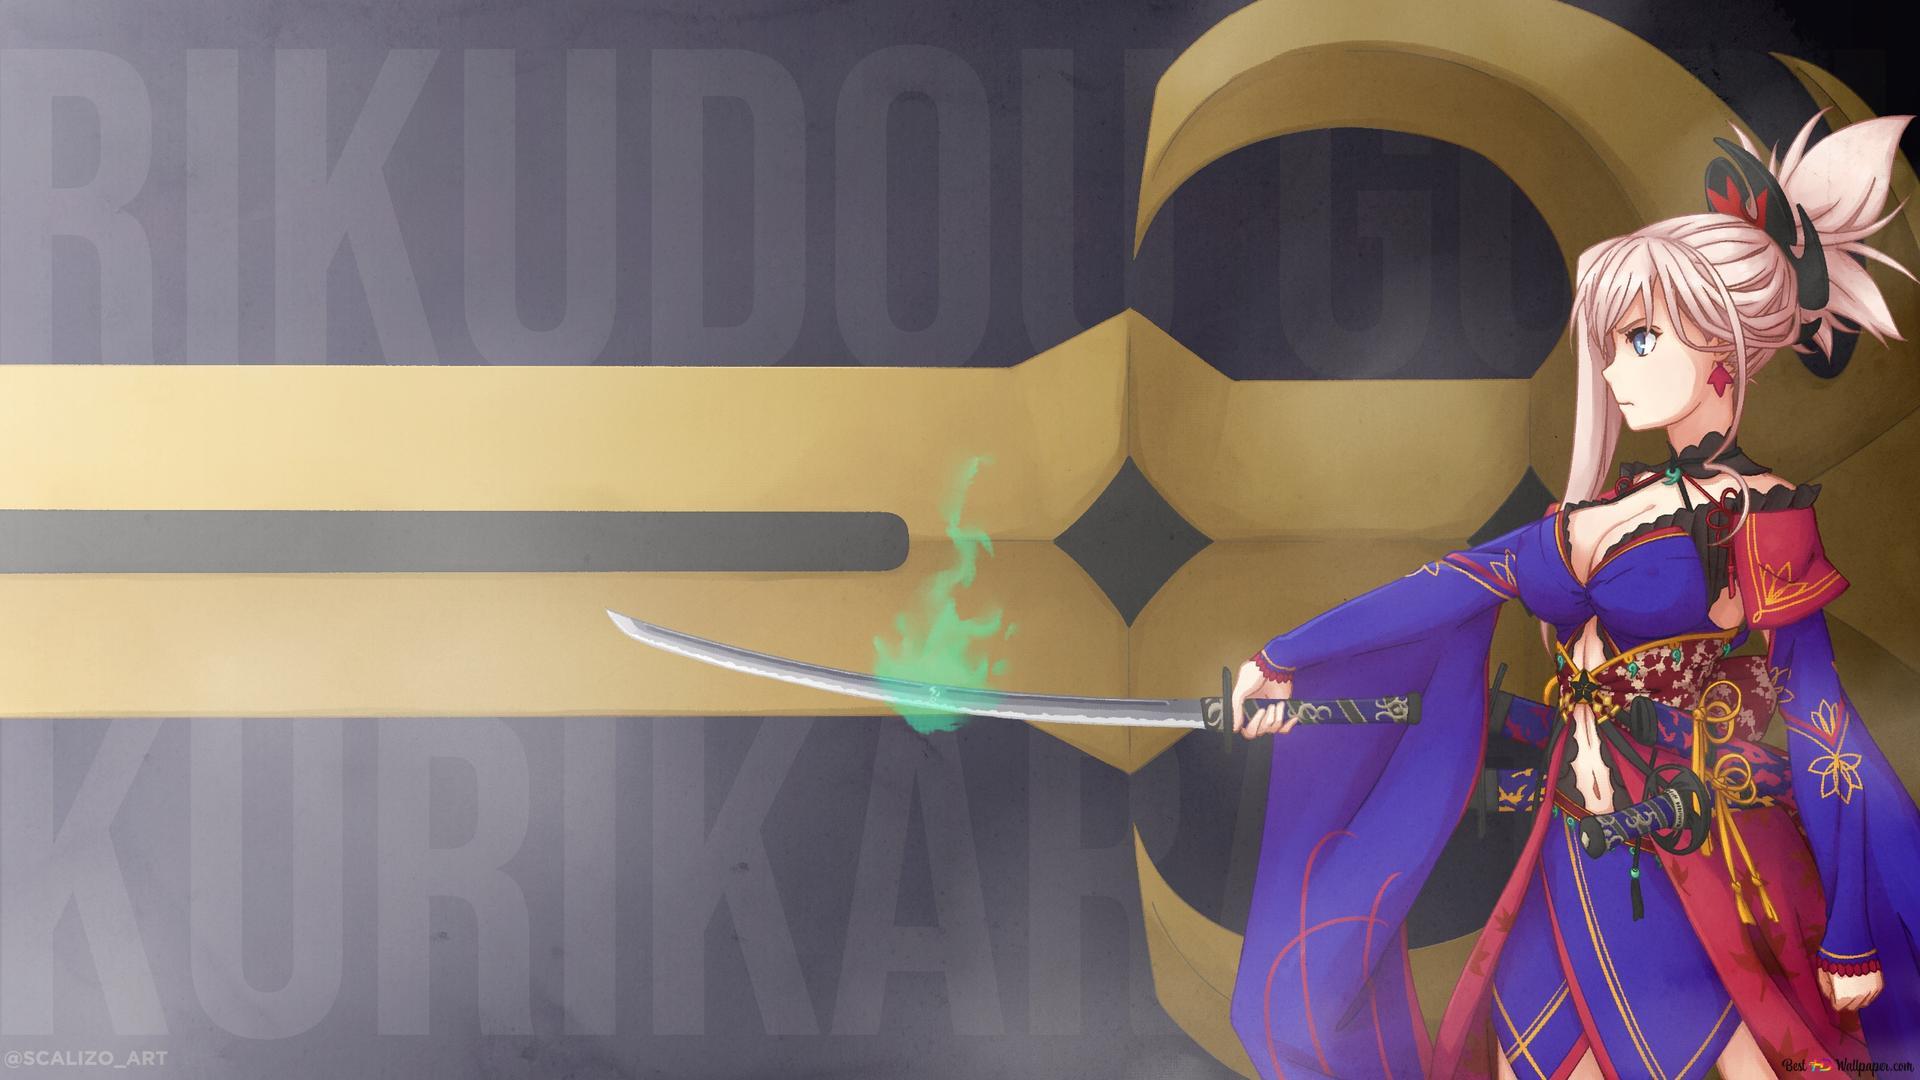 24+ Miyamoto Musashi Fate Grand Order Wallpaper Gif